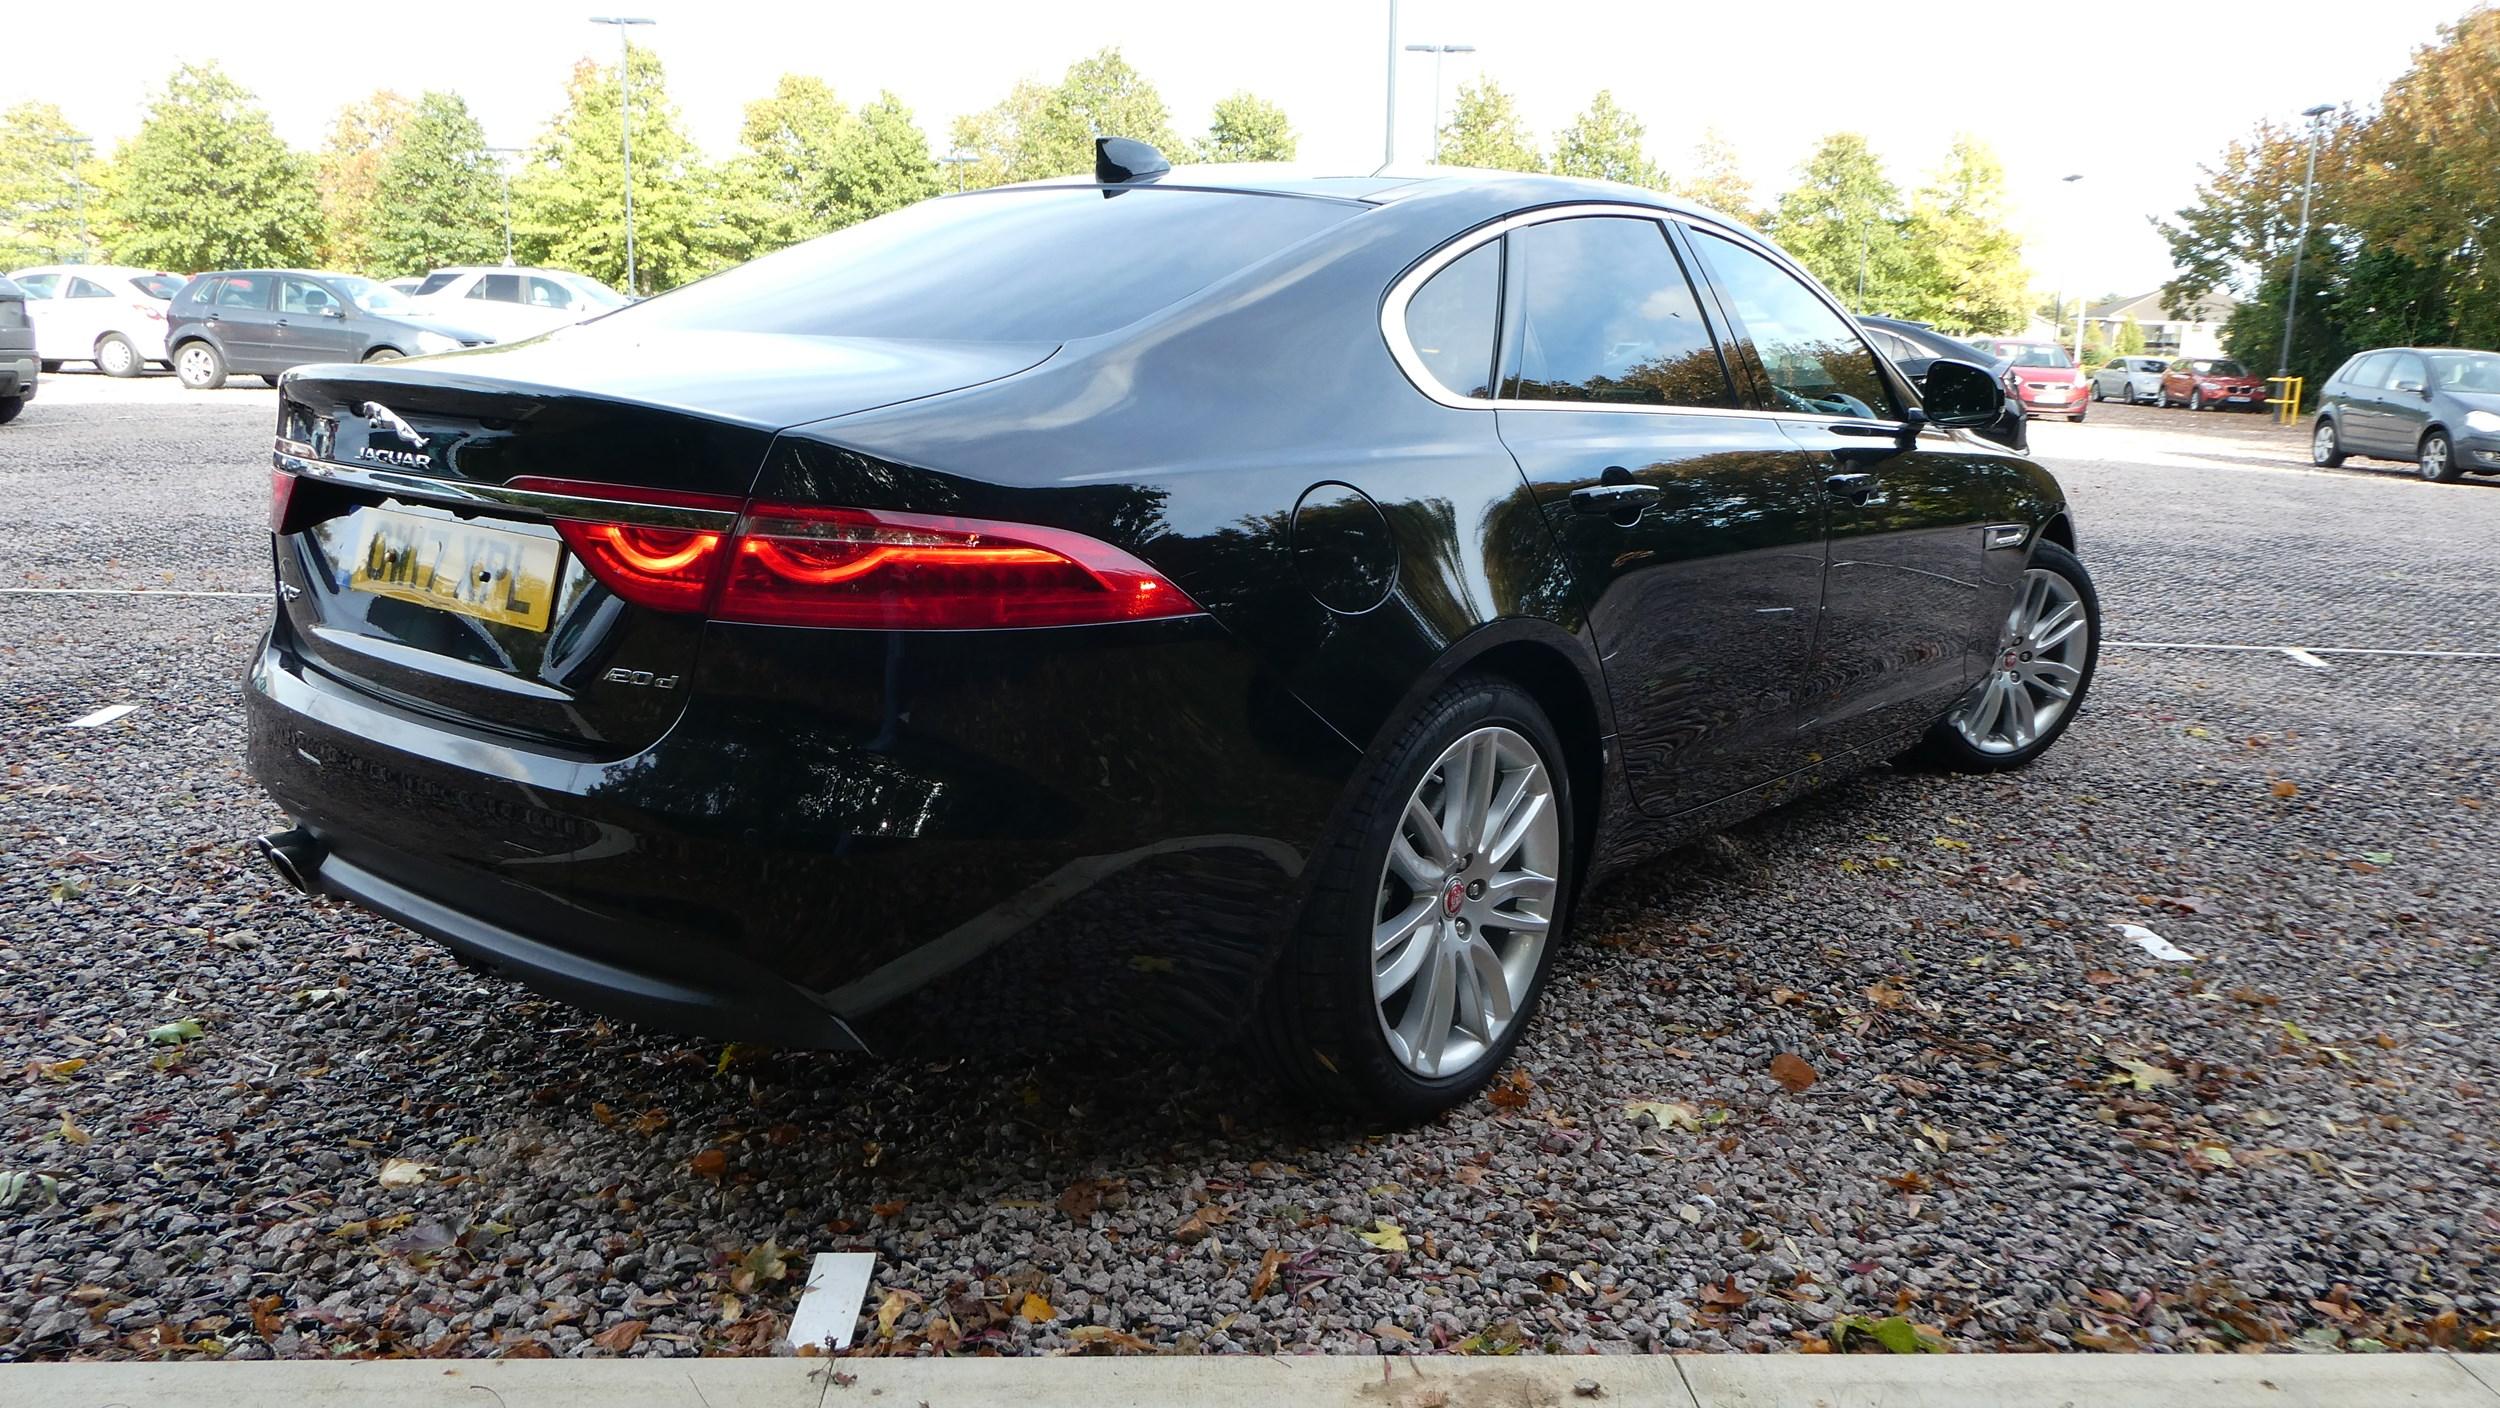 Jaguar XF company car review | Company Car Reviews